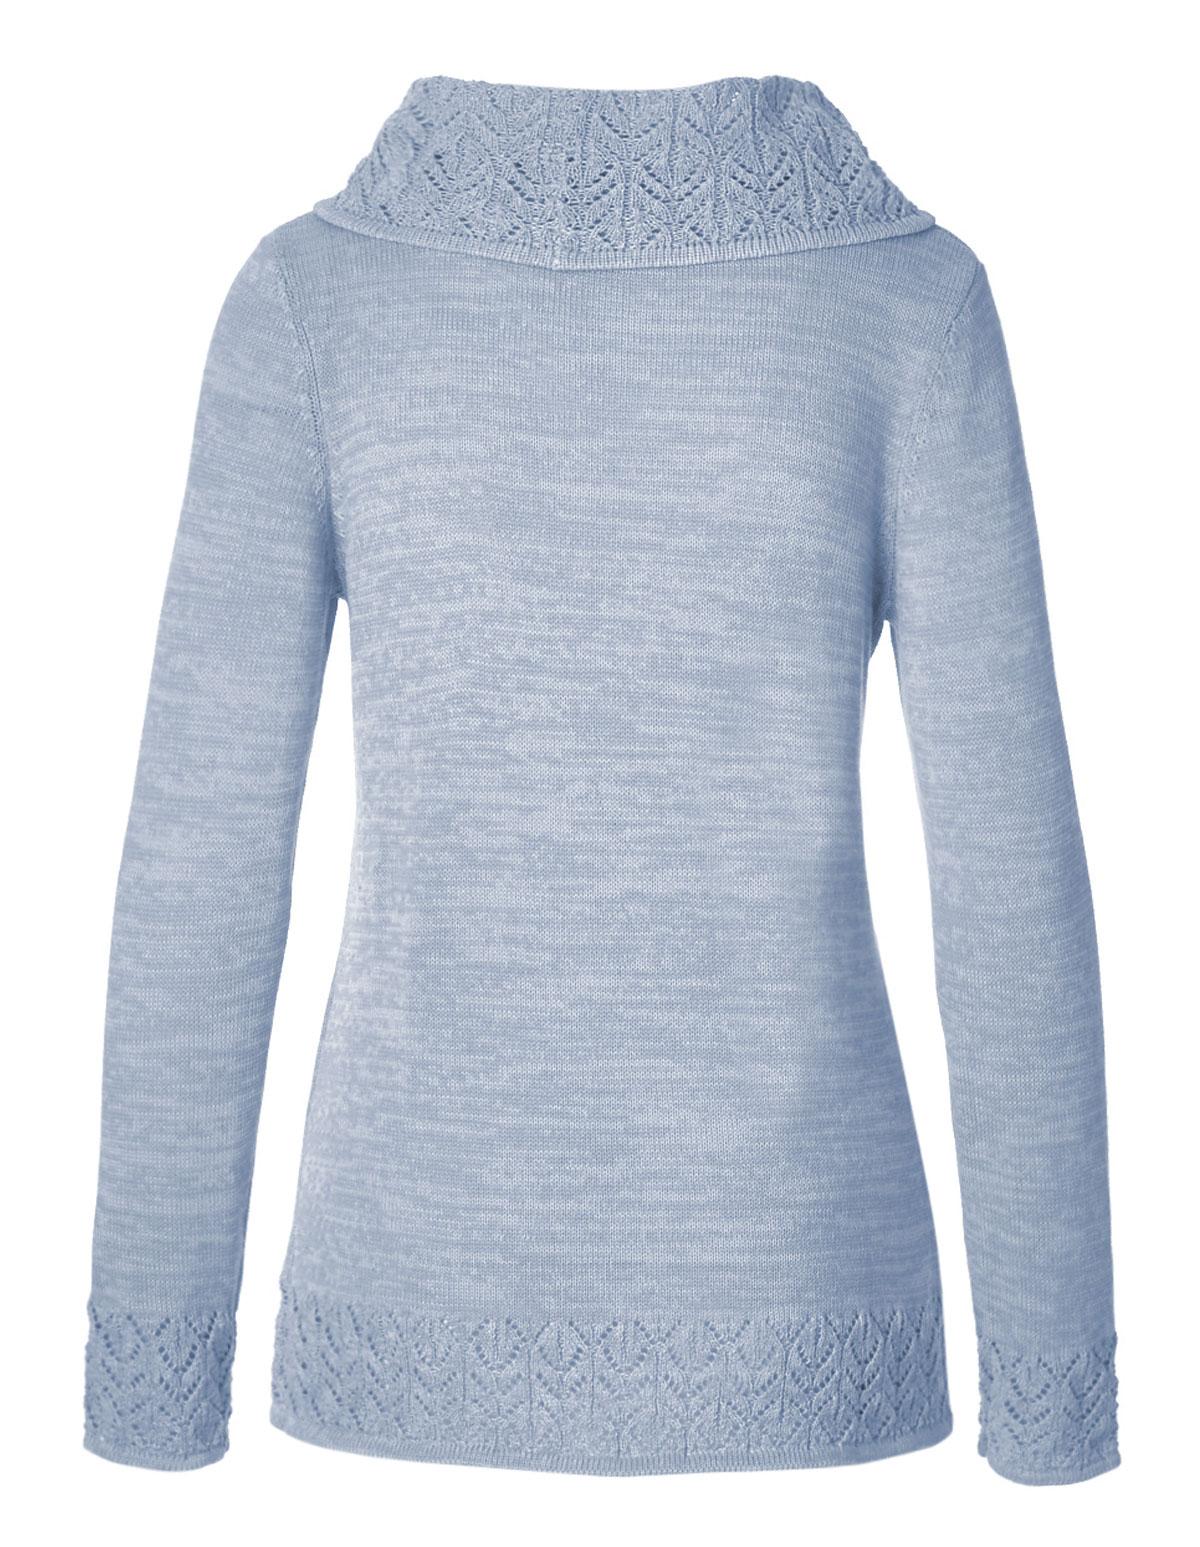 Soft Blue Crochet Hem Sweater | Cleo